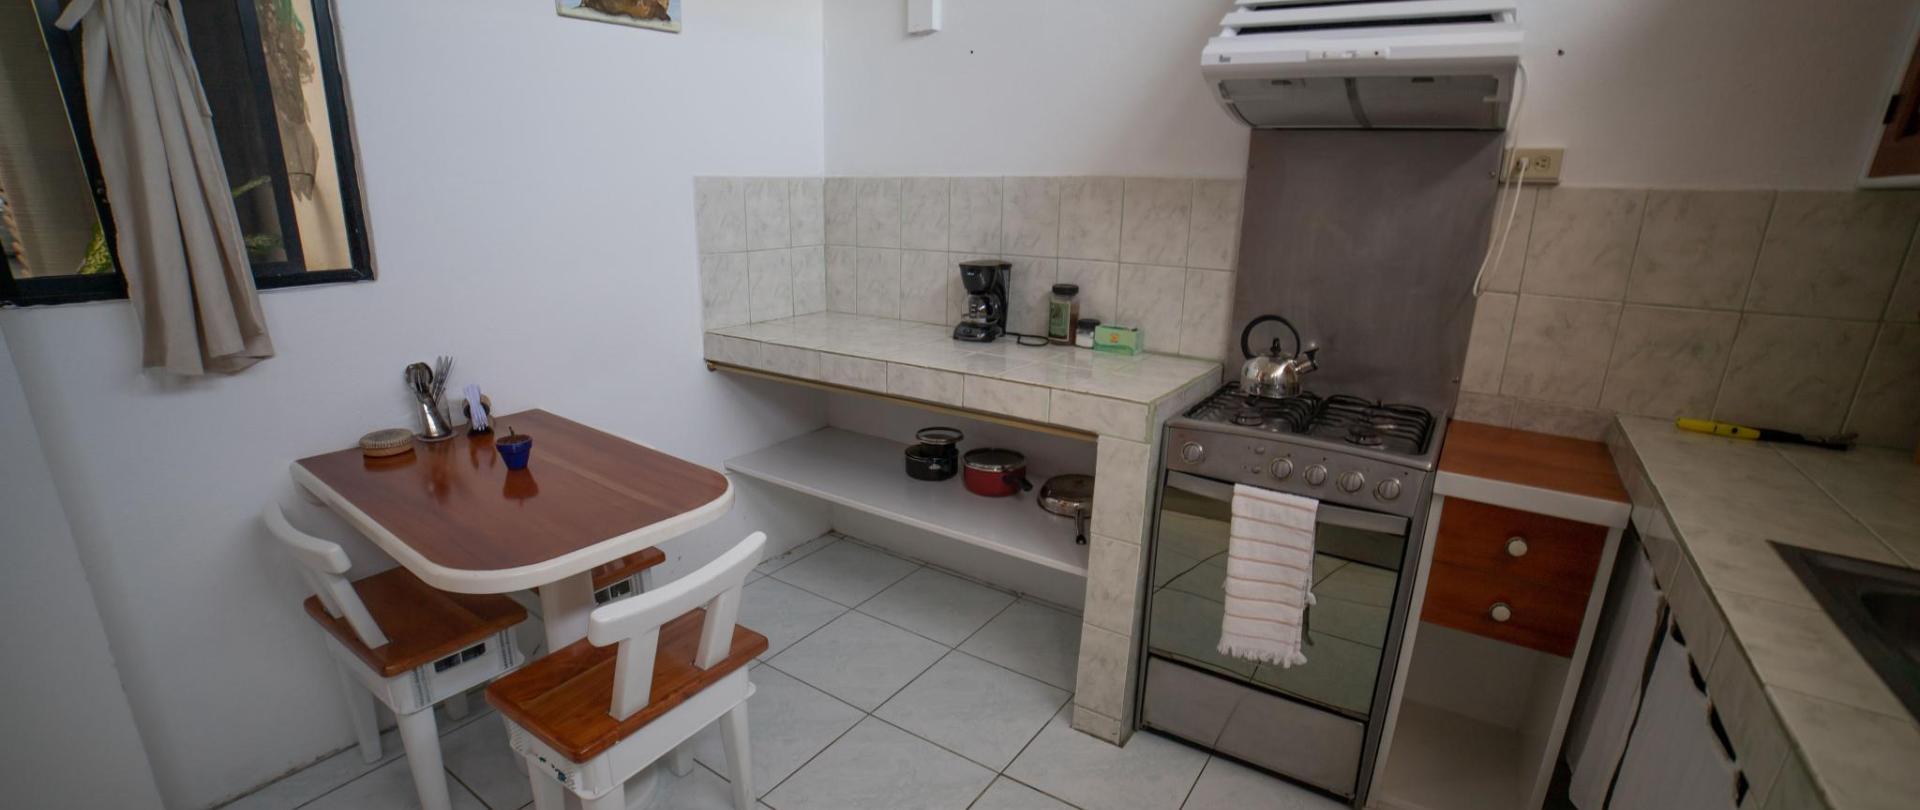 Guest House K-Leta - Pequena (49).JPG